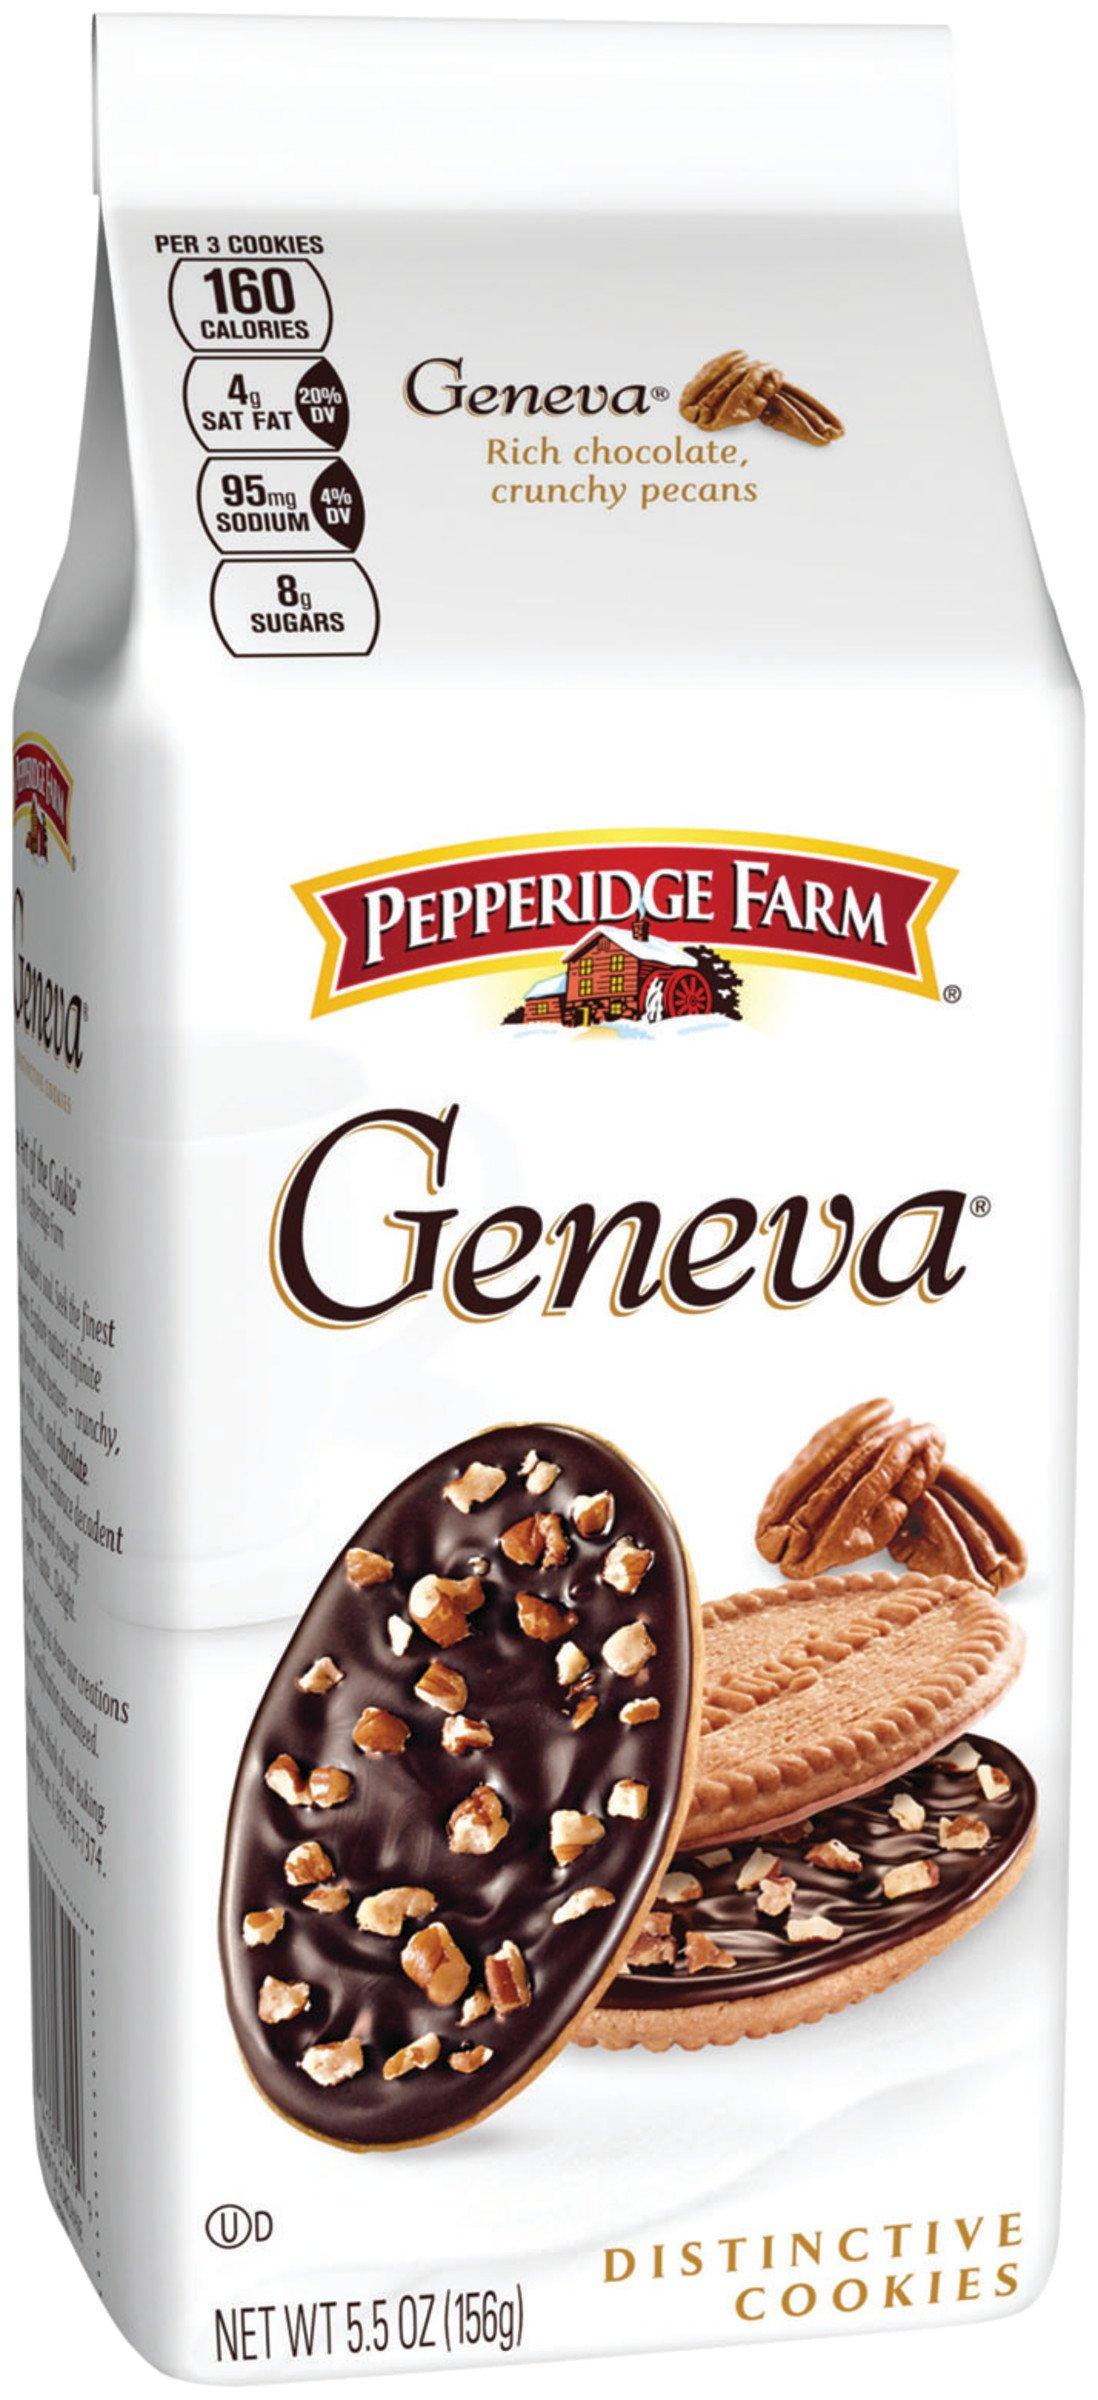 Pepperidge Farm, Geneva, Cookies, 5.5 oz, Bag, 24-count